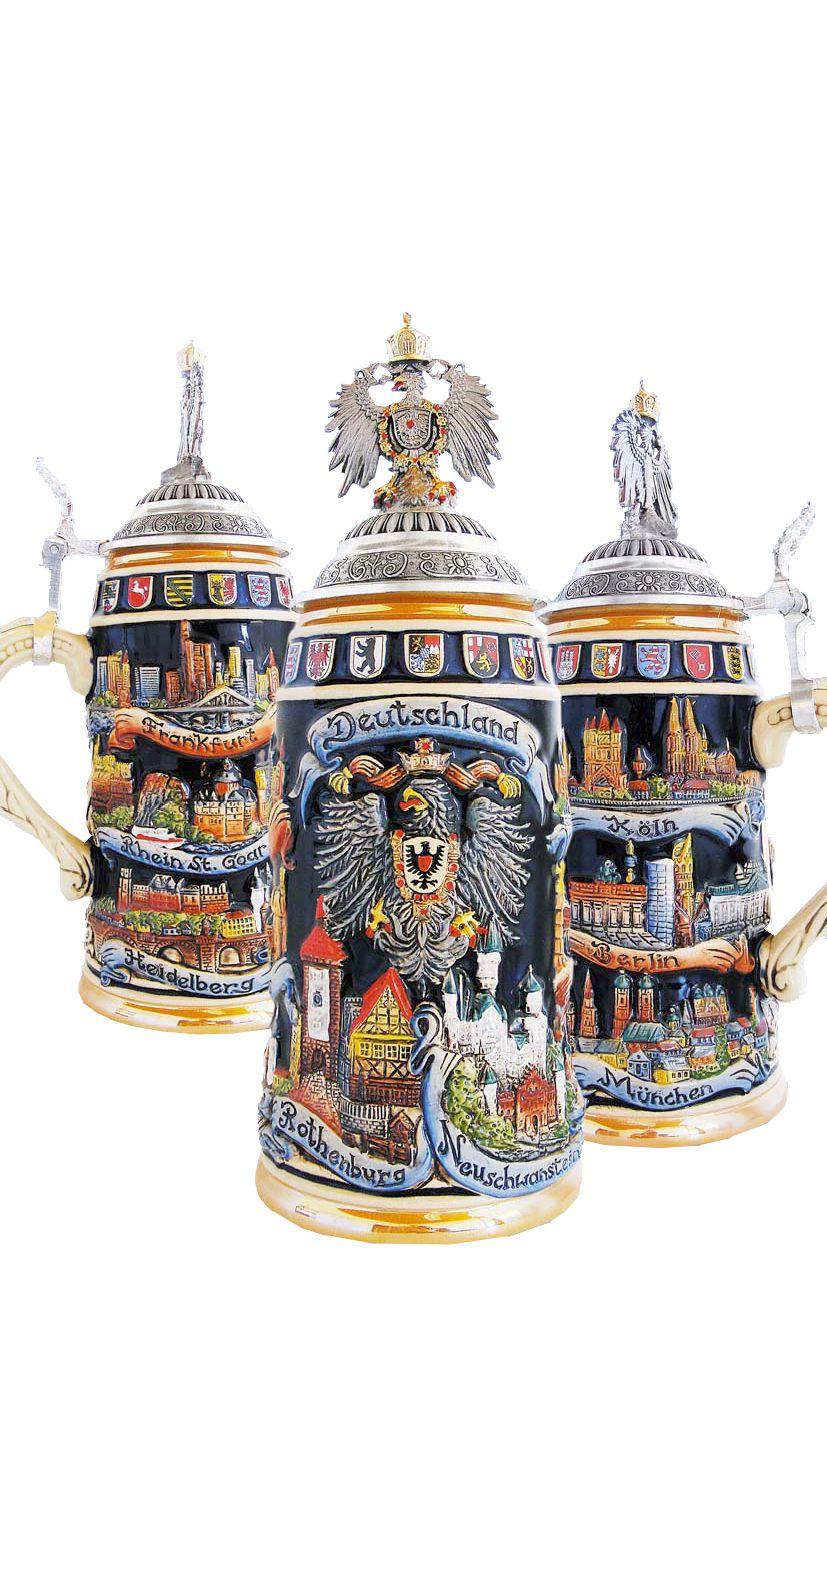 German Beer Stein cities 1 liter